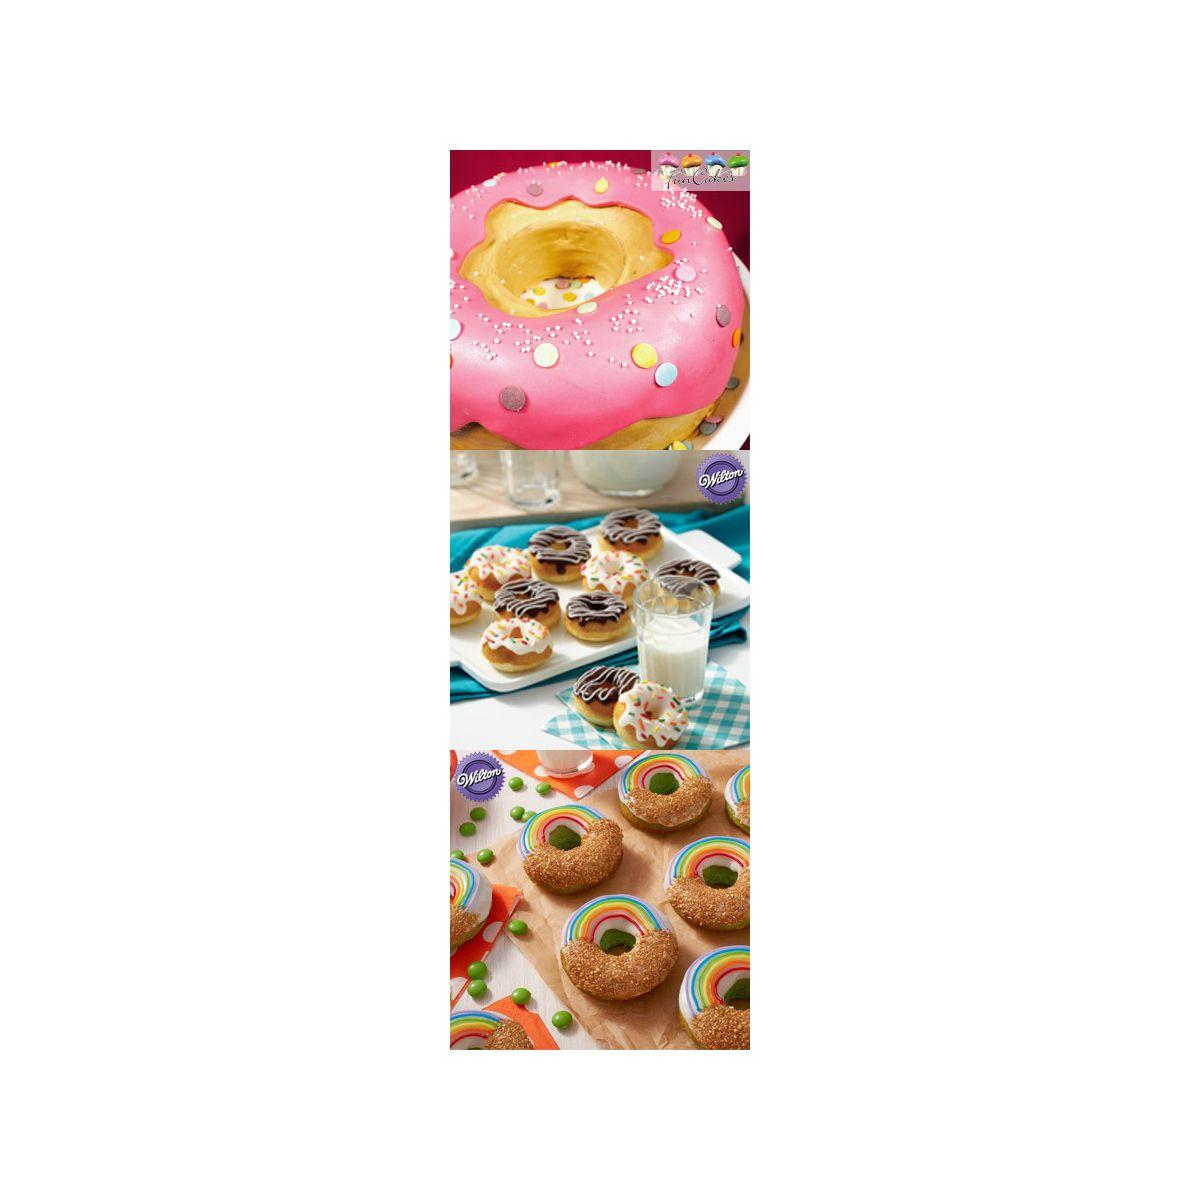 Image - Donut